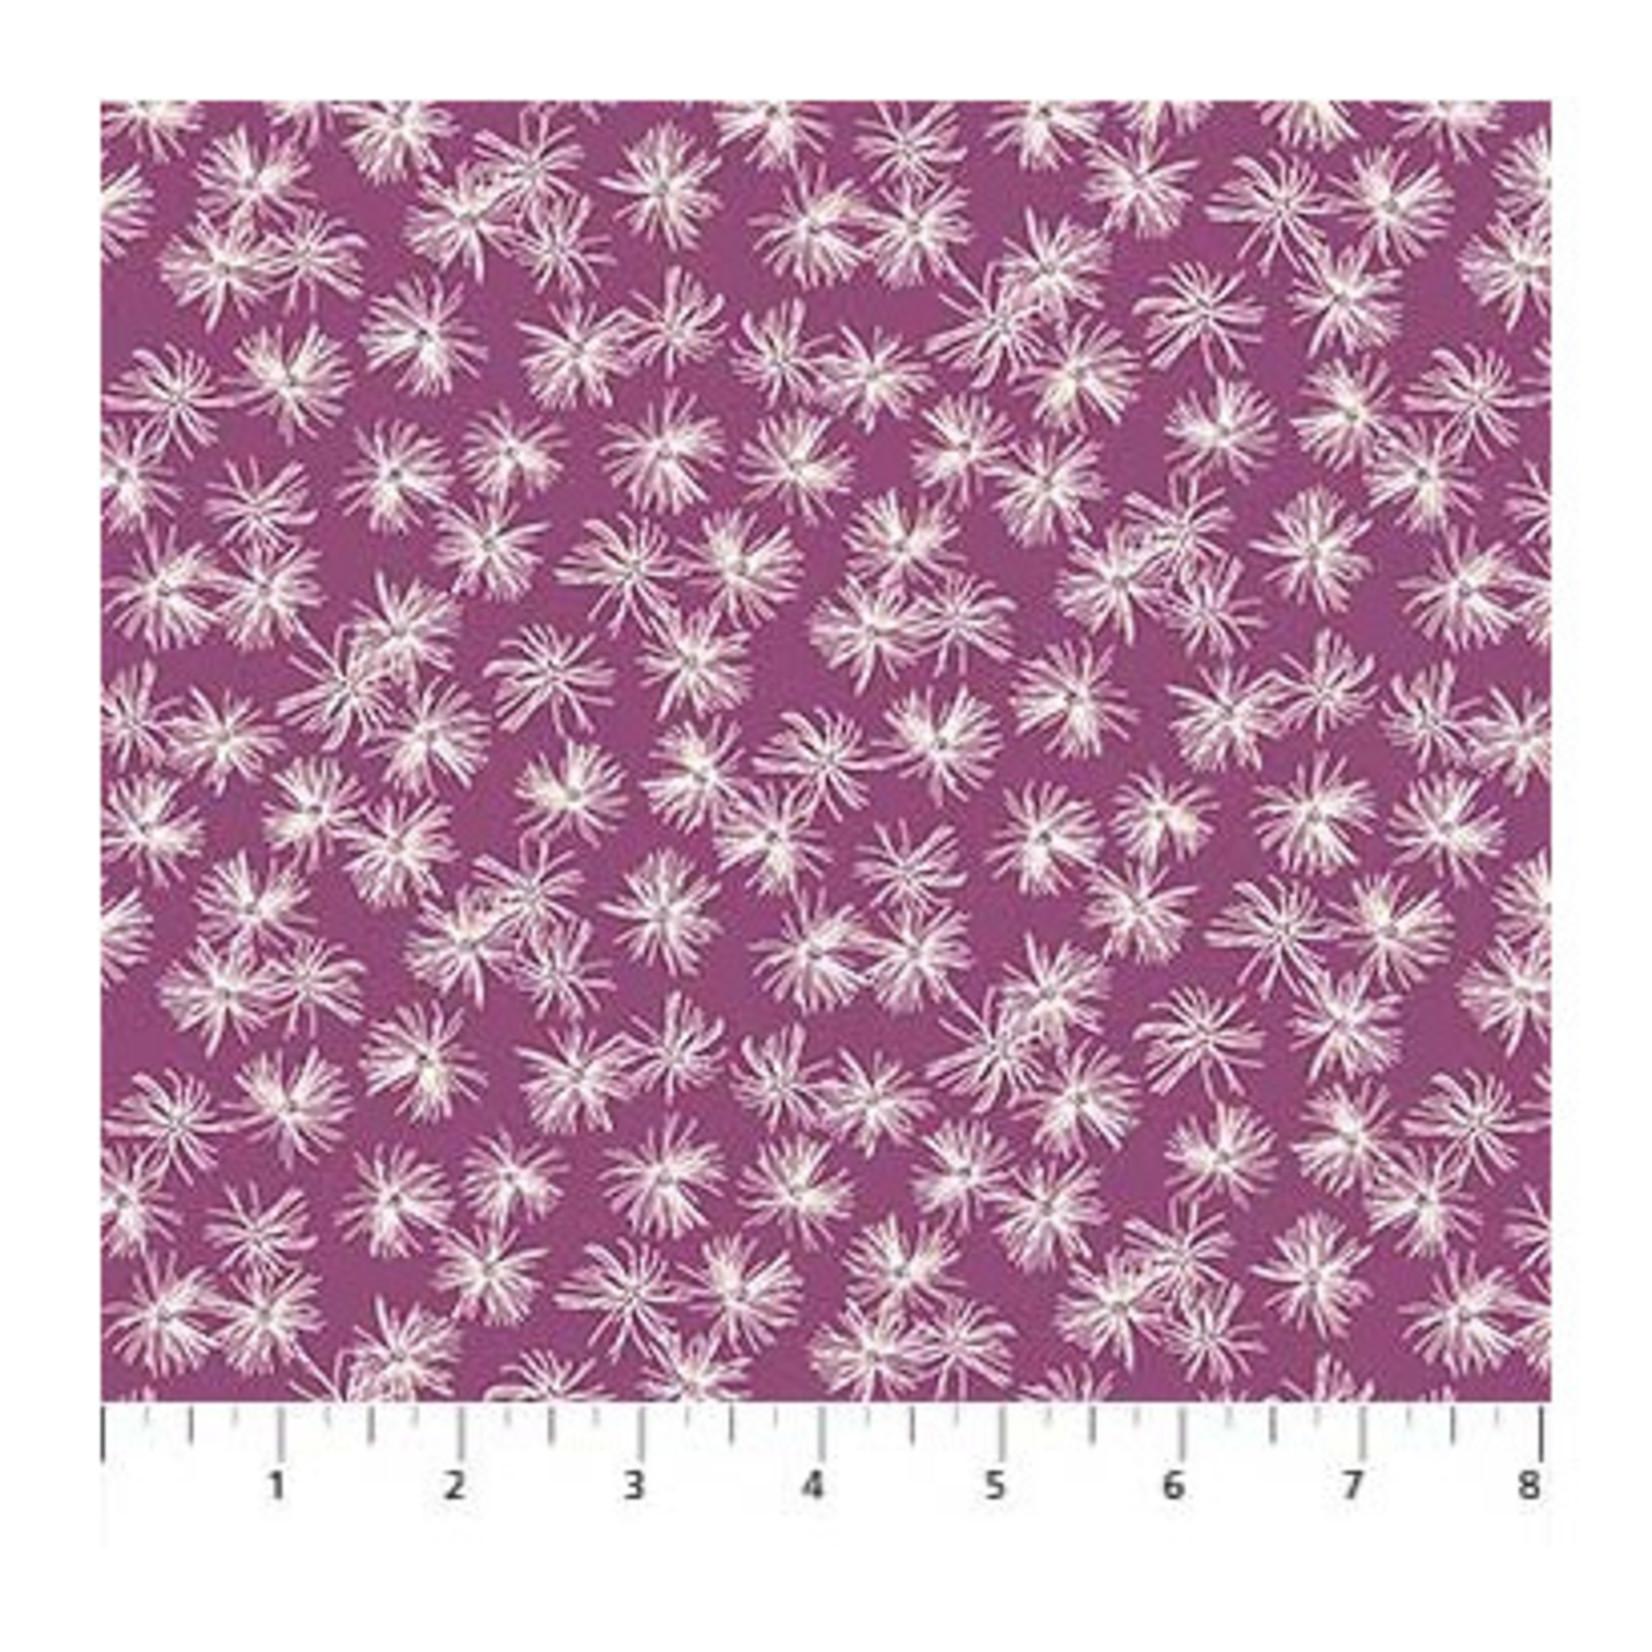 Figo Fabrics Mountain Meadow - Dandelions - Purple